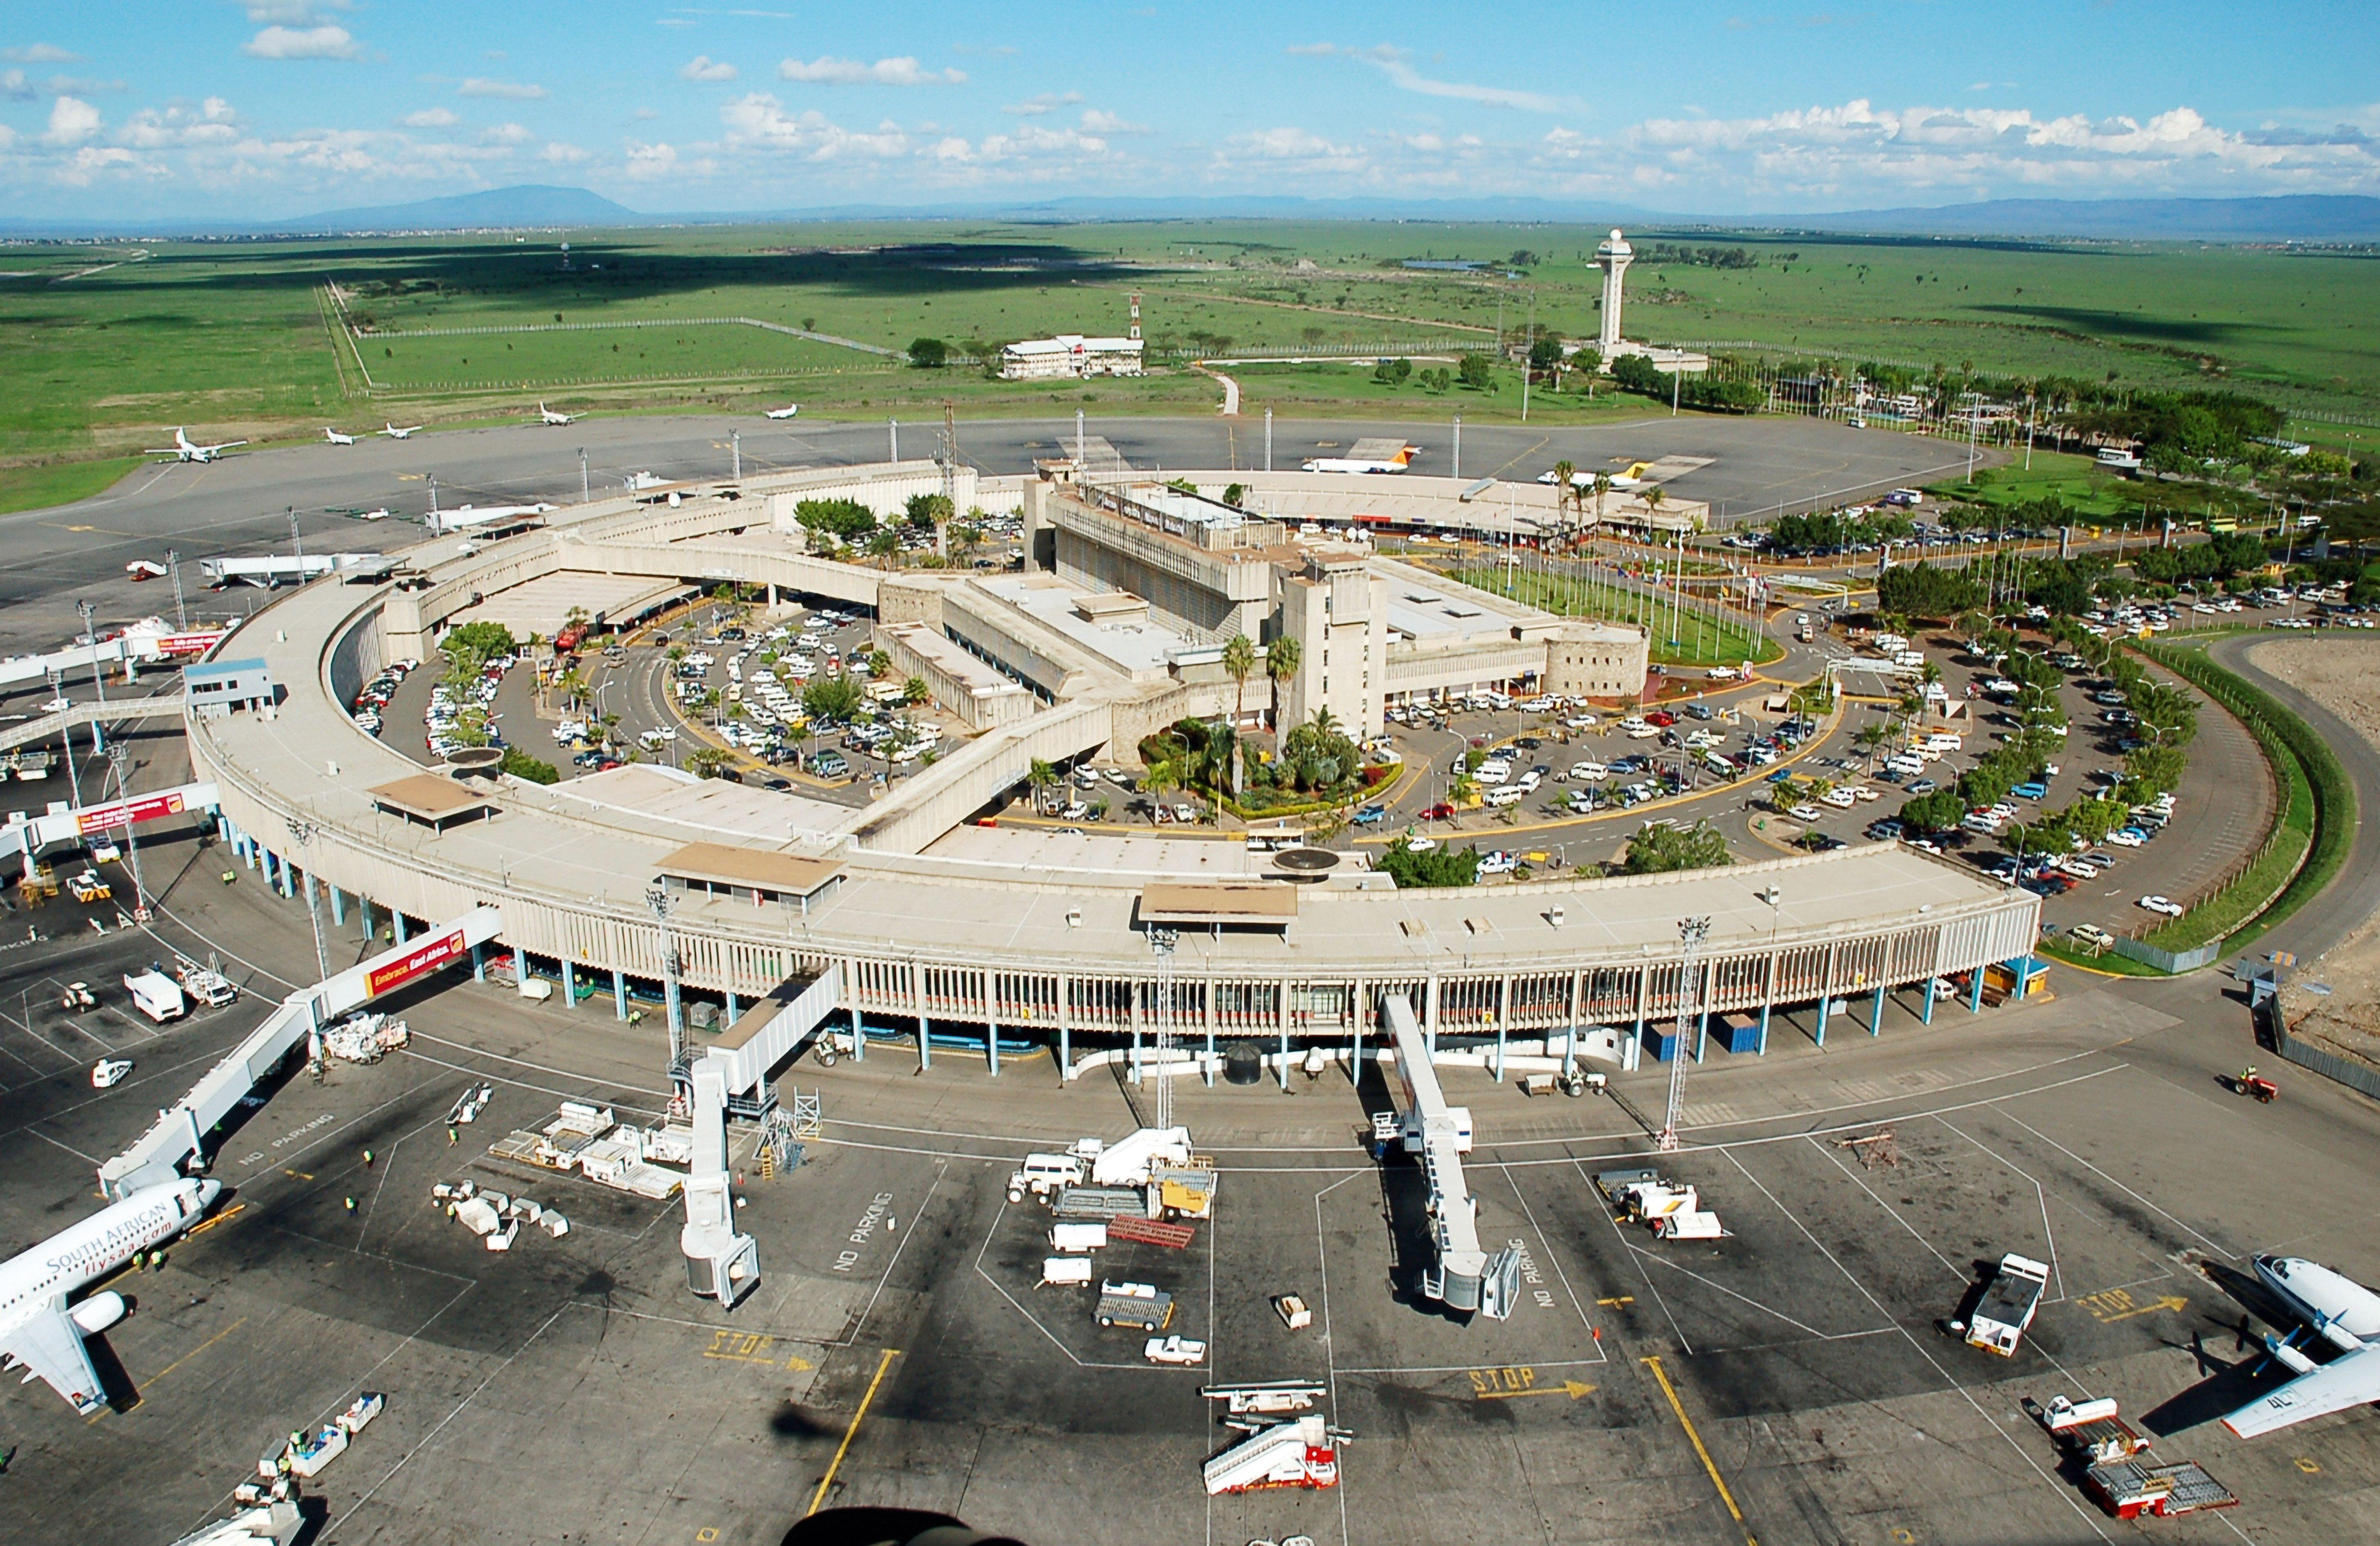 Aeroporto Nairobi : Nairobi airport airplanes airports airlines and